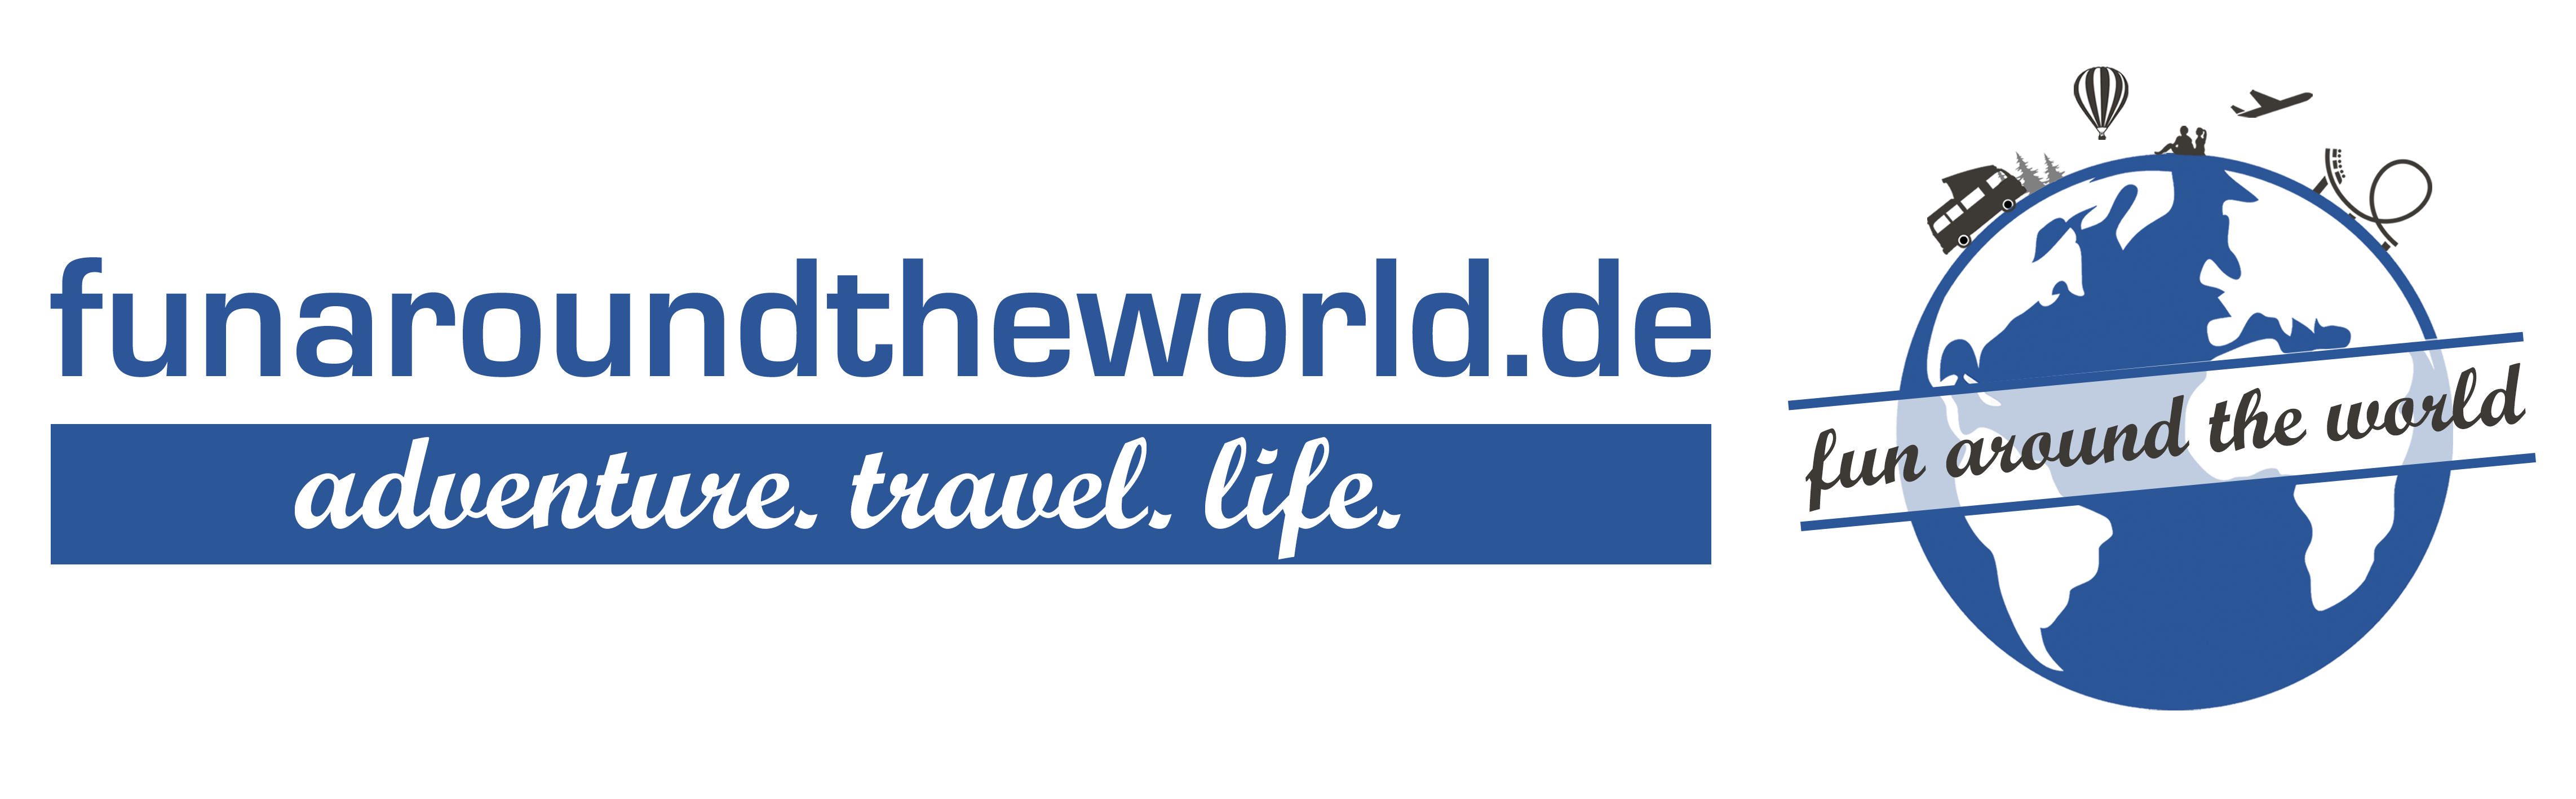 funaroundtheworld.de – Freizeitparks – Offroad – Adrenalin – Wandern – Abenteuer